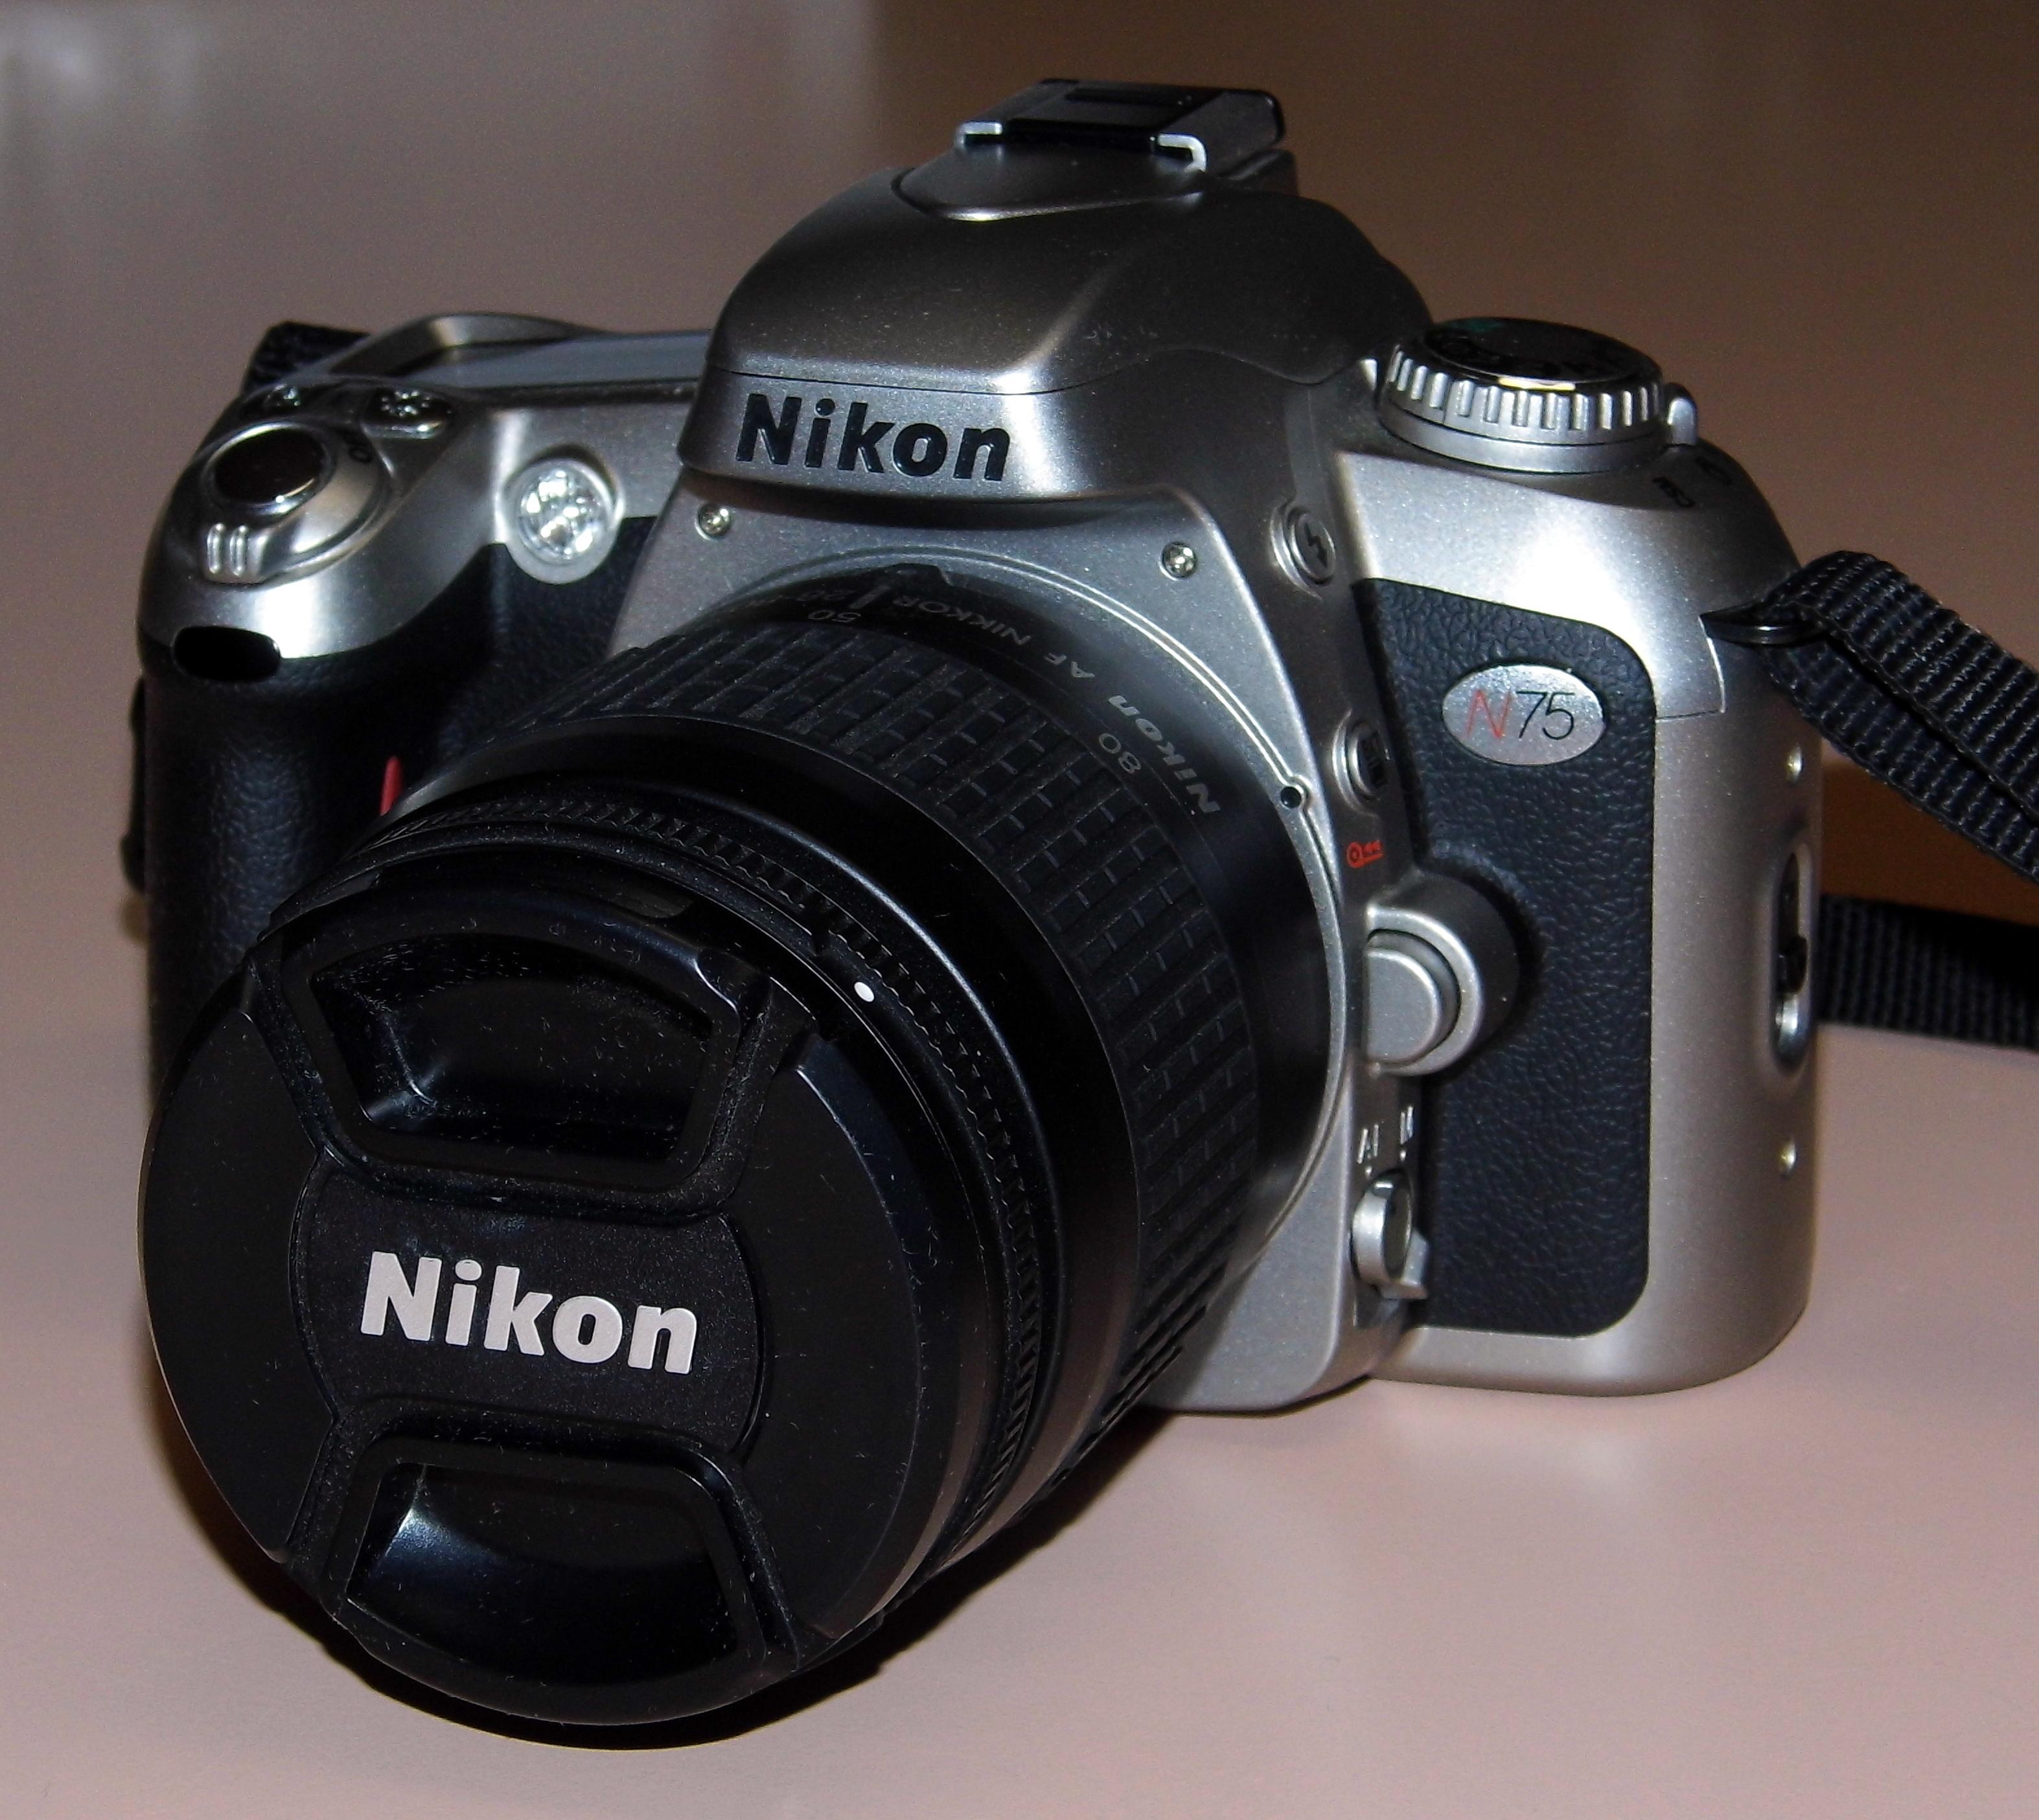 Filenikon Model N75 35mm Slr Film Camera With Nikkor 28 80mm F33